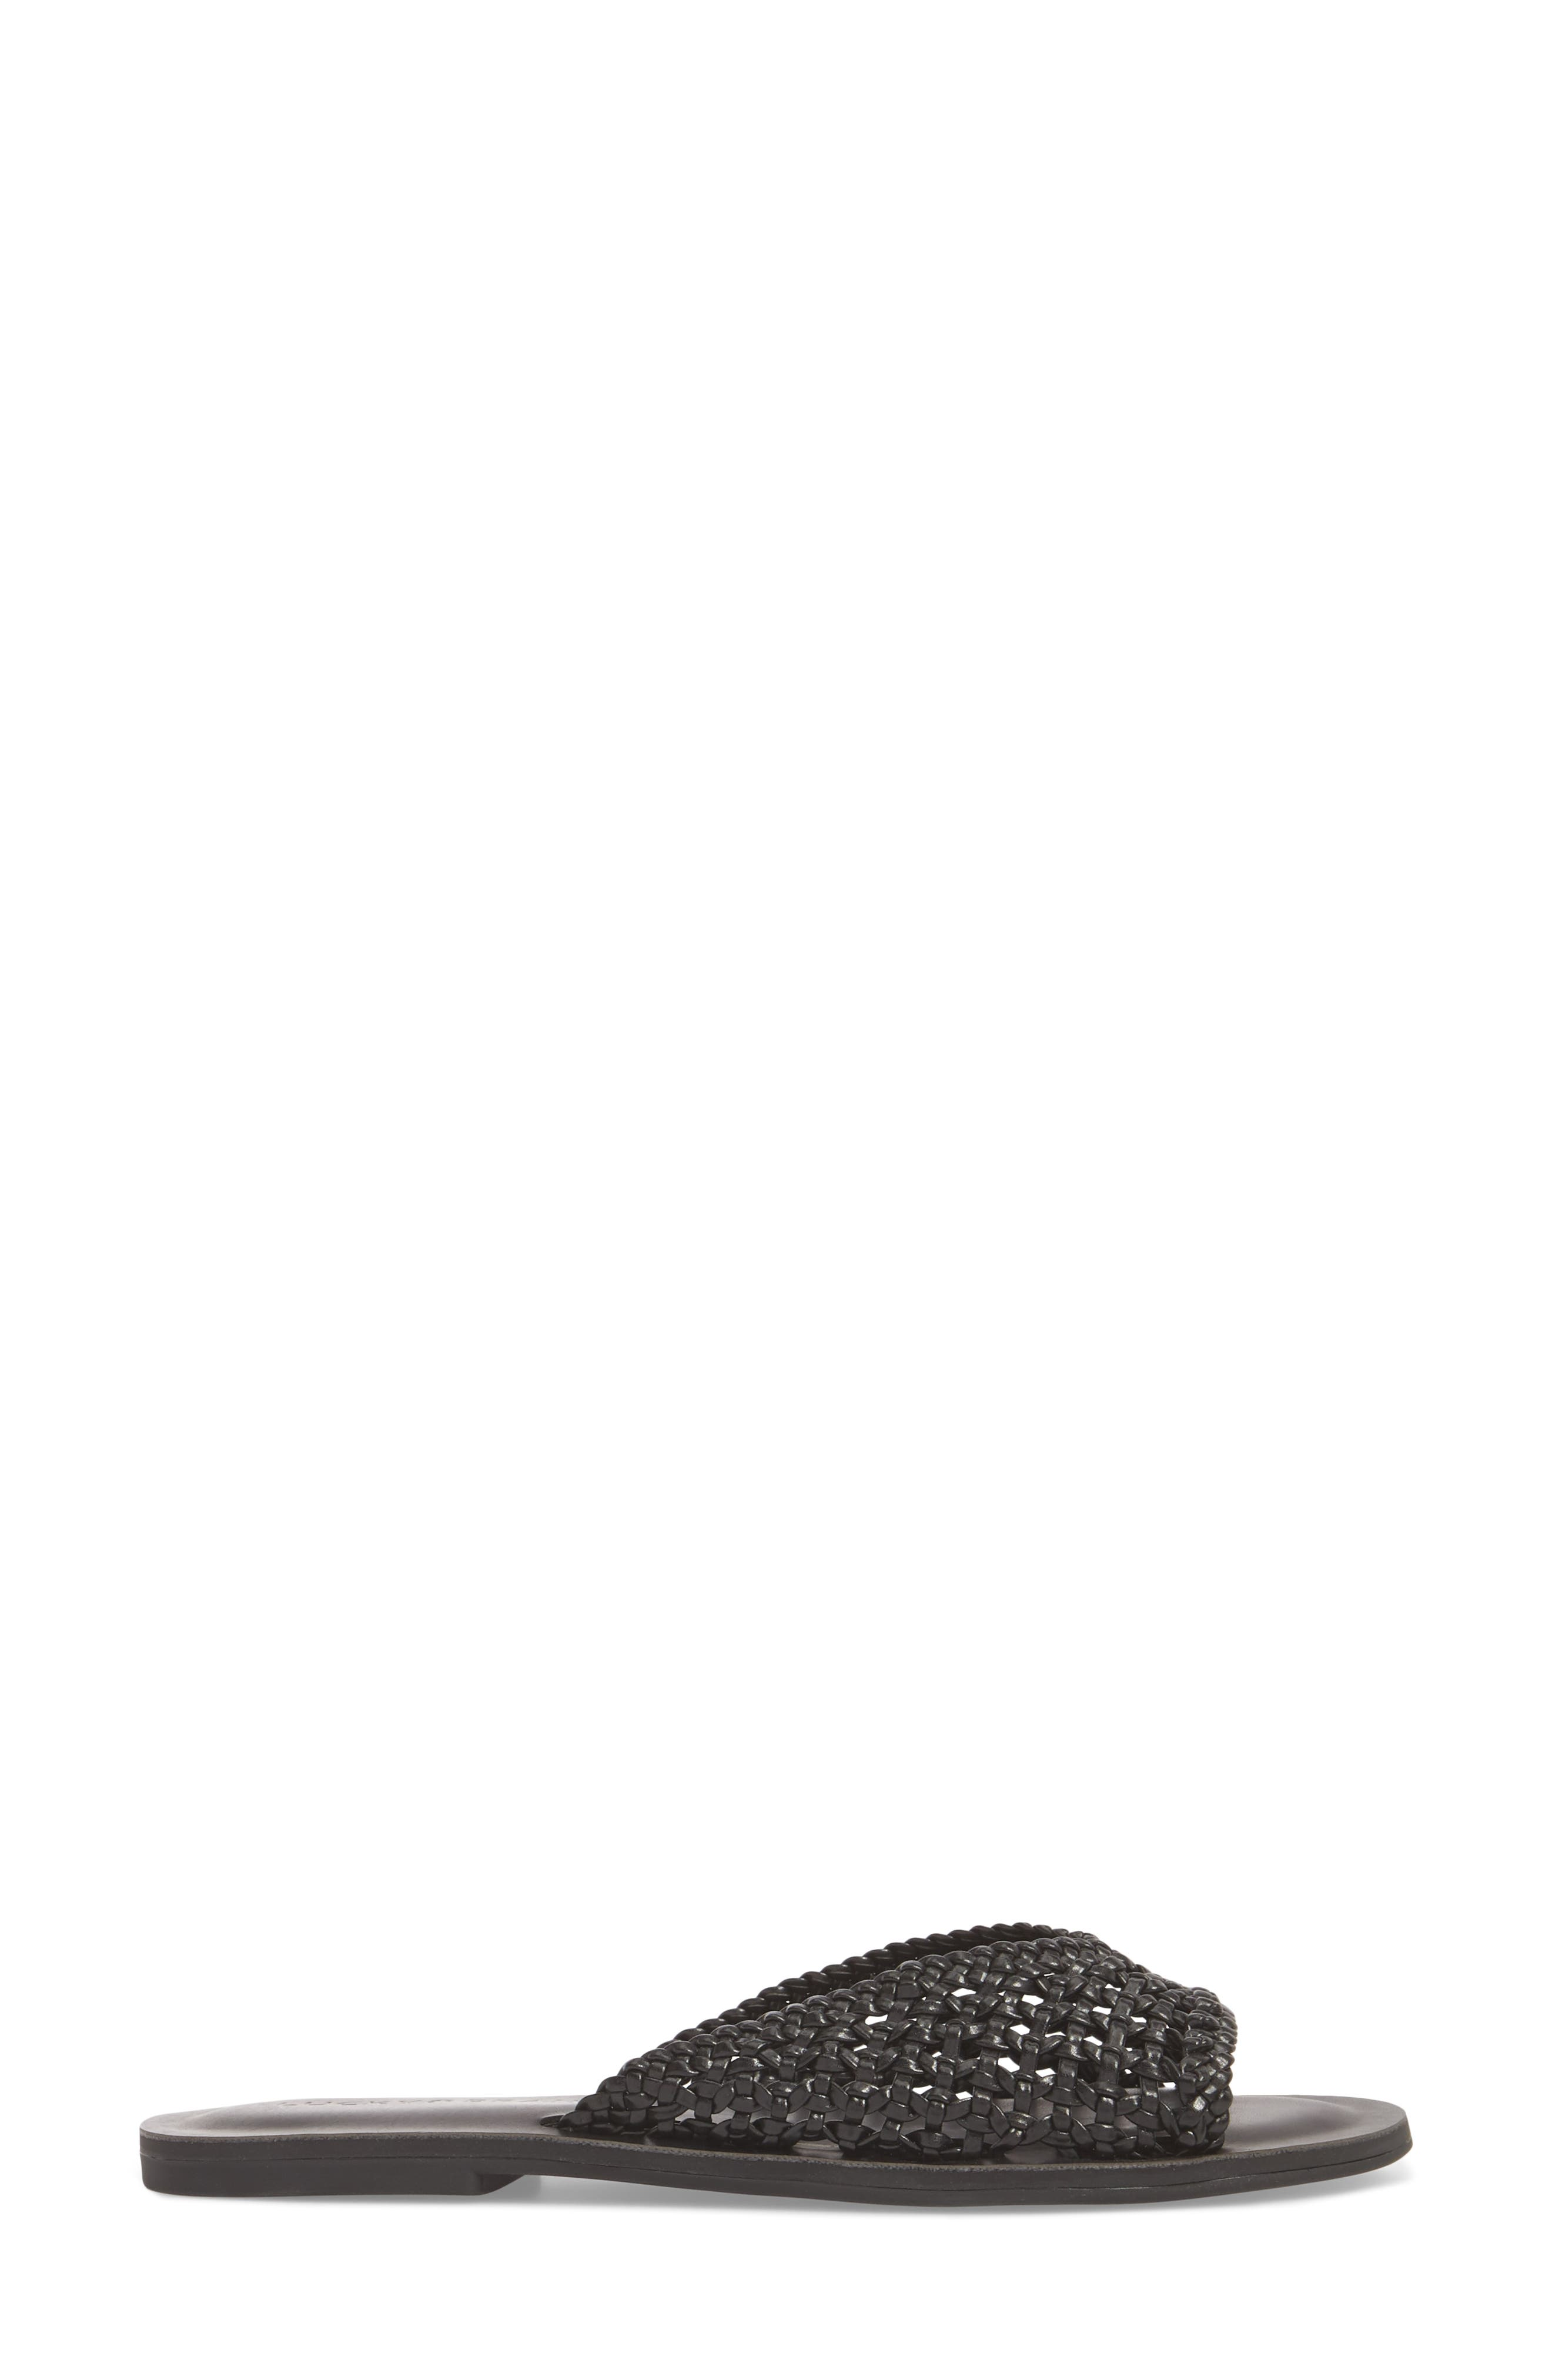 Adola Slide Sandal,                             Alternate thumbnail 3, color,                             Black Leather